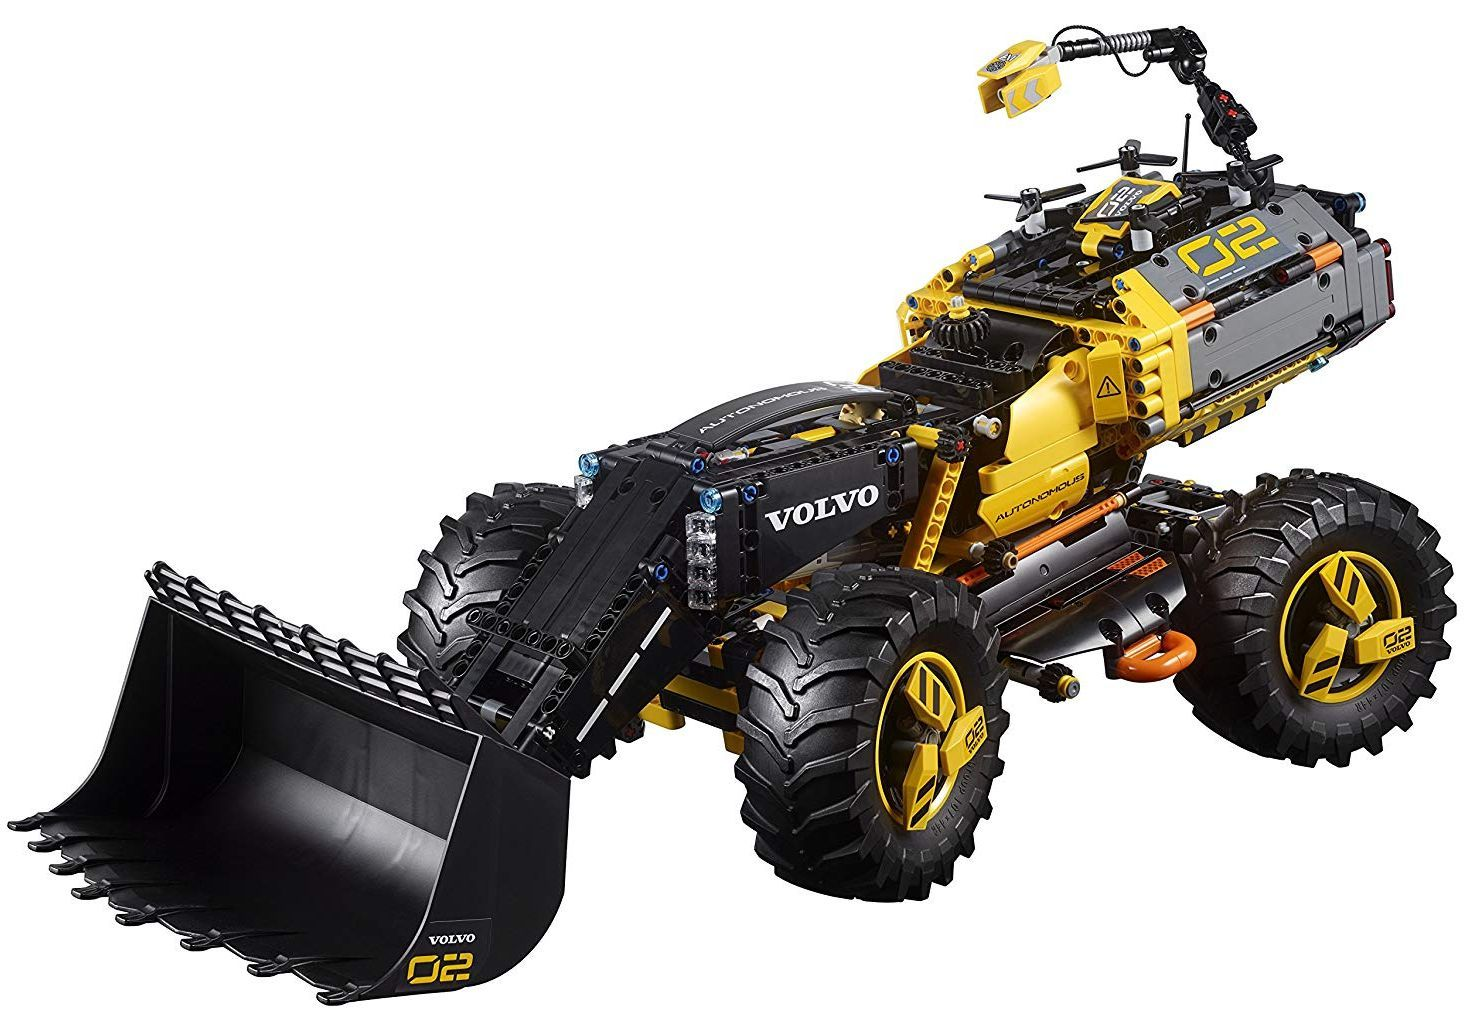 Конструктор Lego Technic - Volvo концепция, колесен товарач (42081) - 8